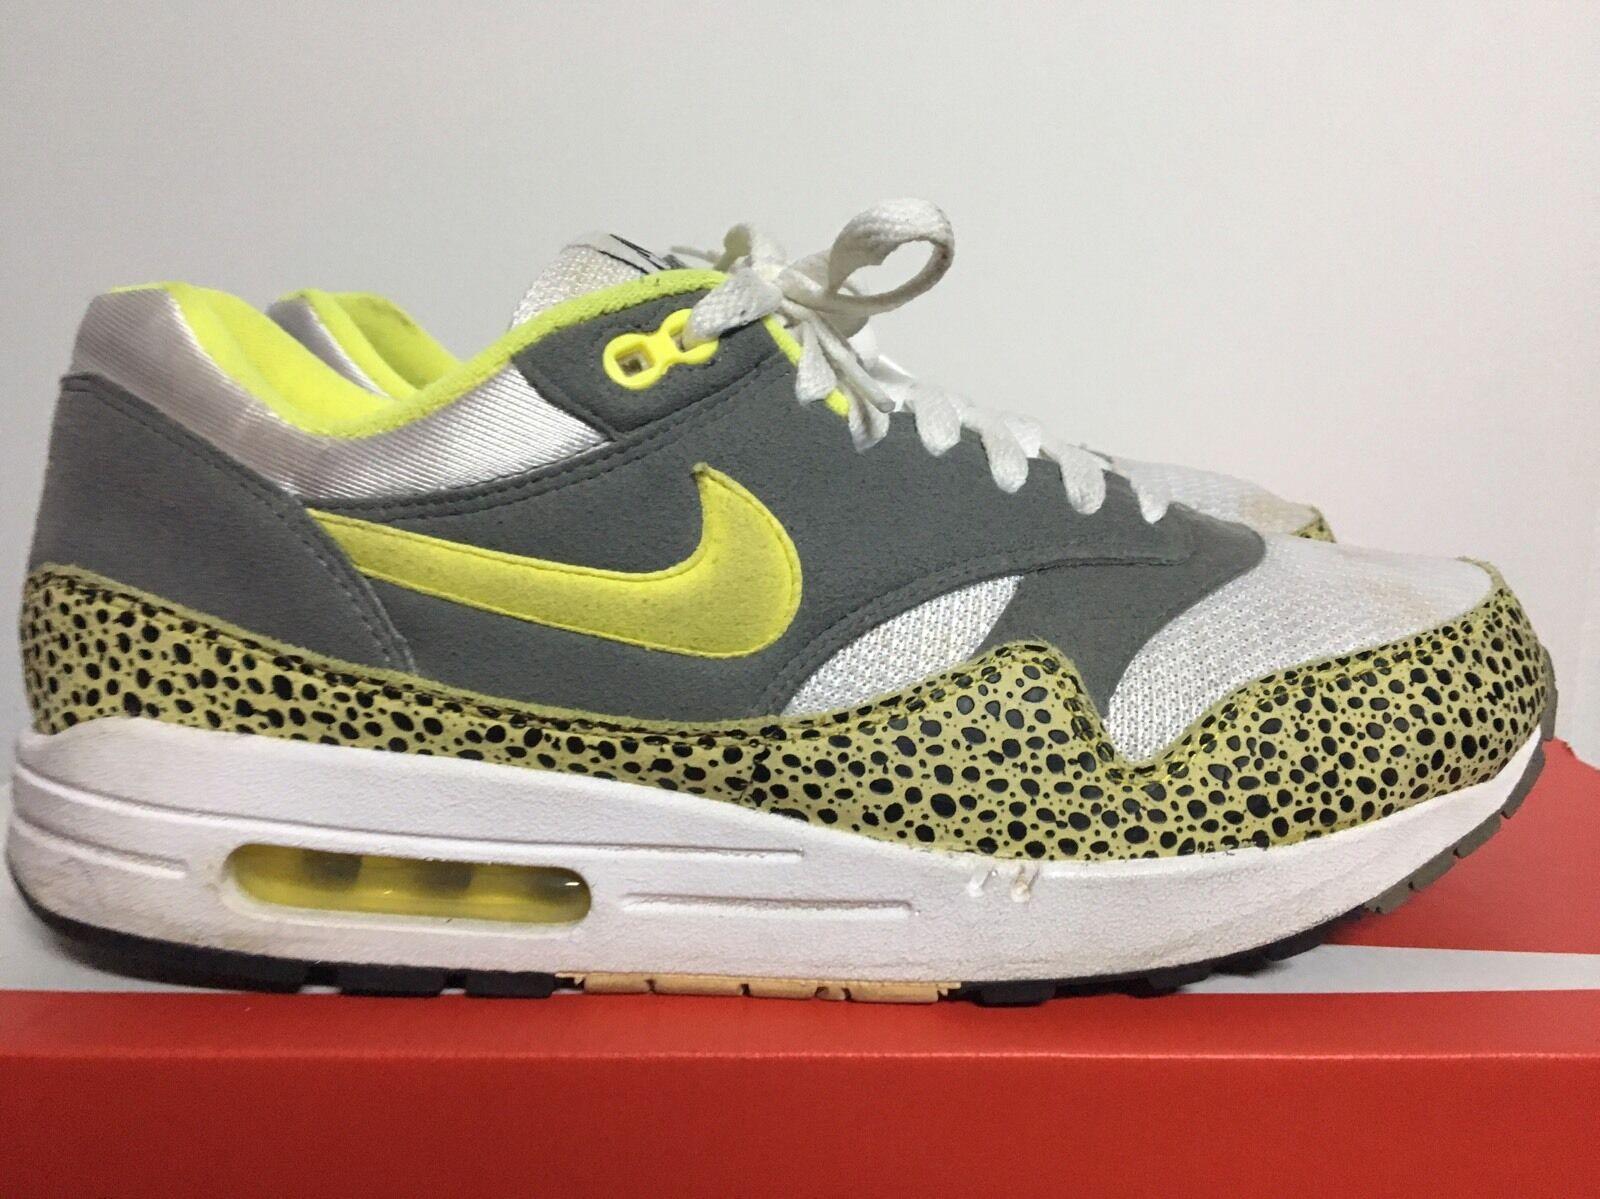 Nike Air Max 1 US 10,5 Off White Atmos Animal Jordan Kith Boost Patta NMD 97